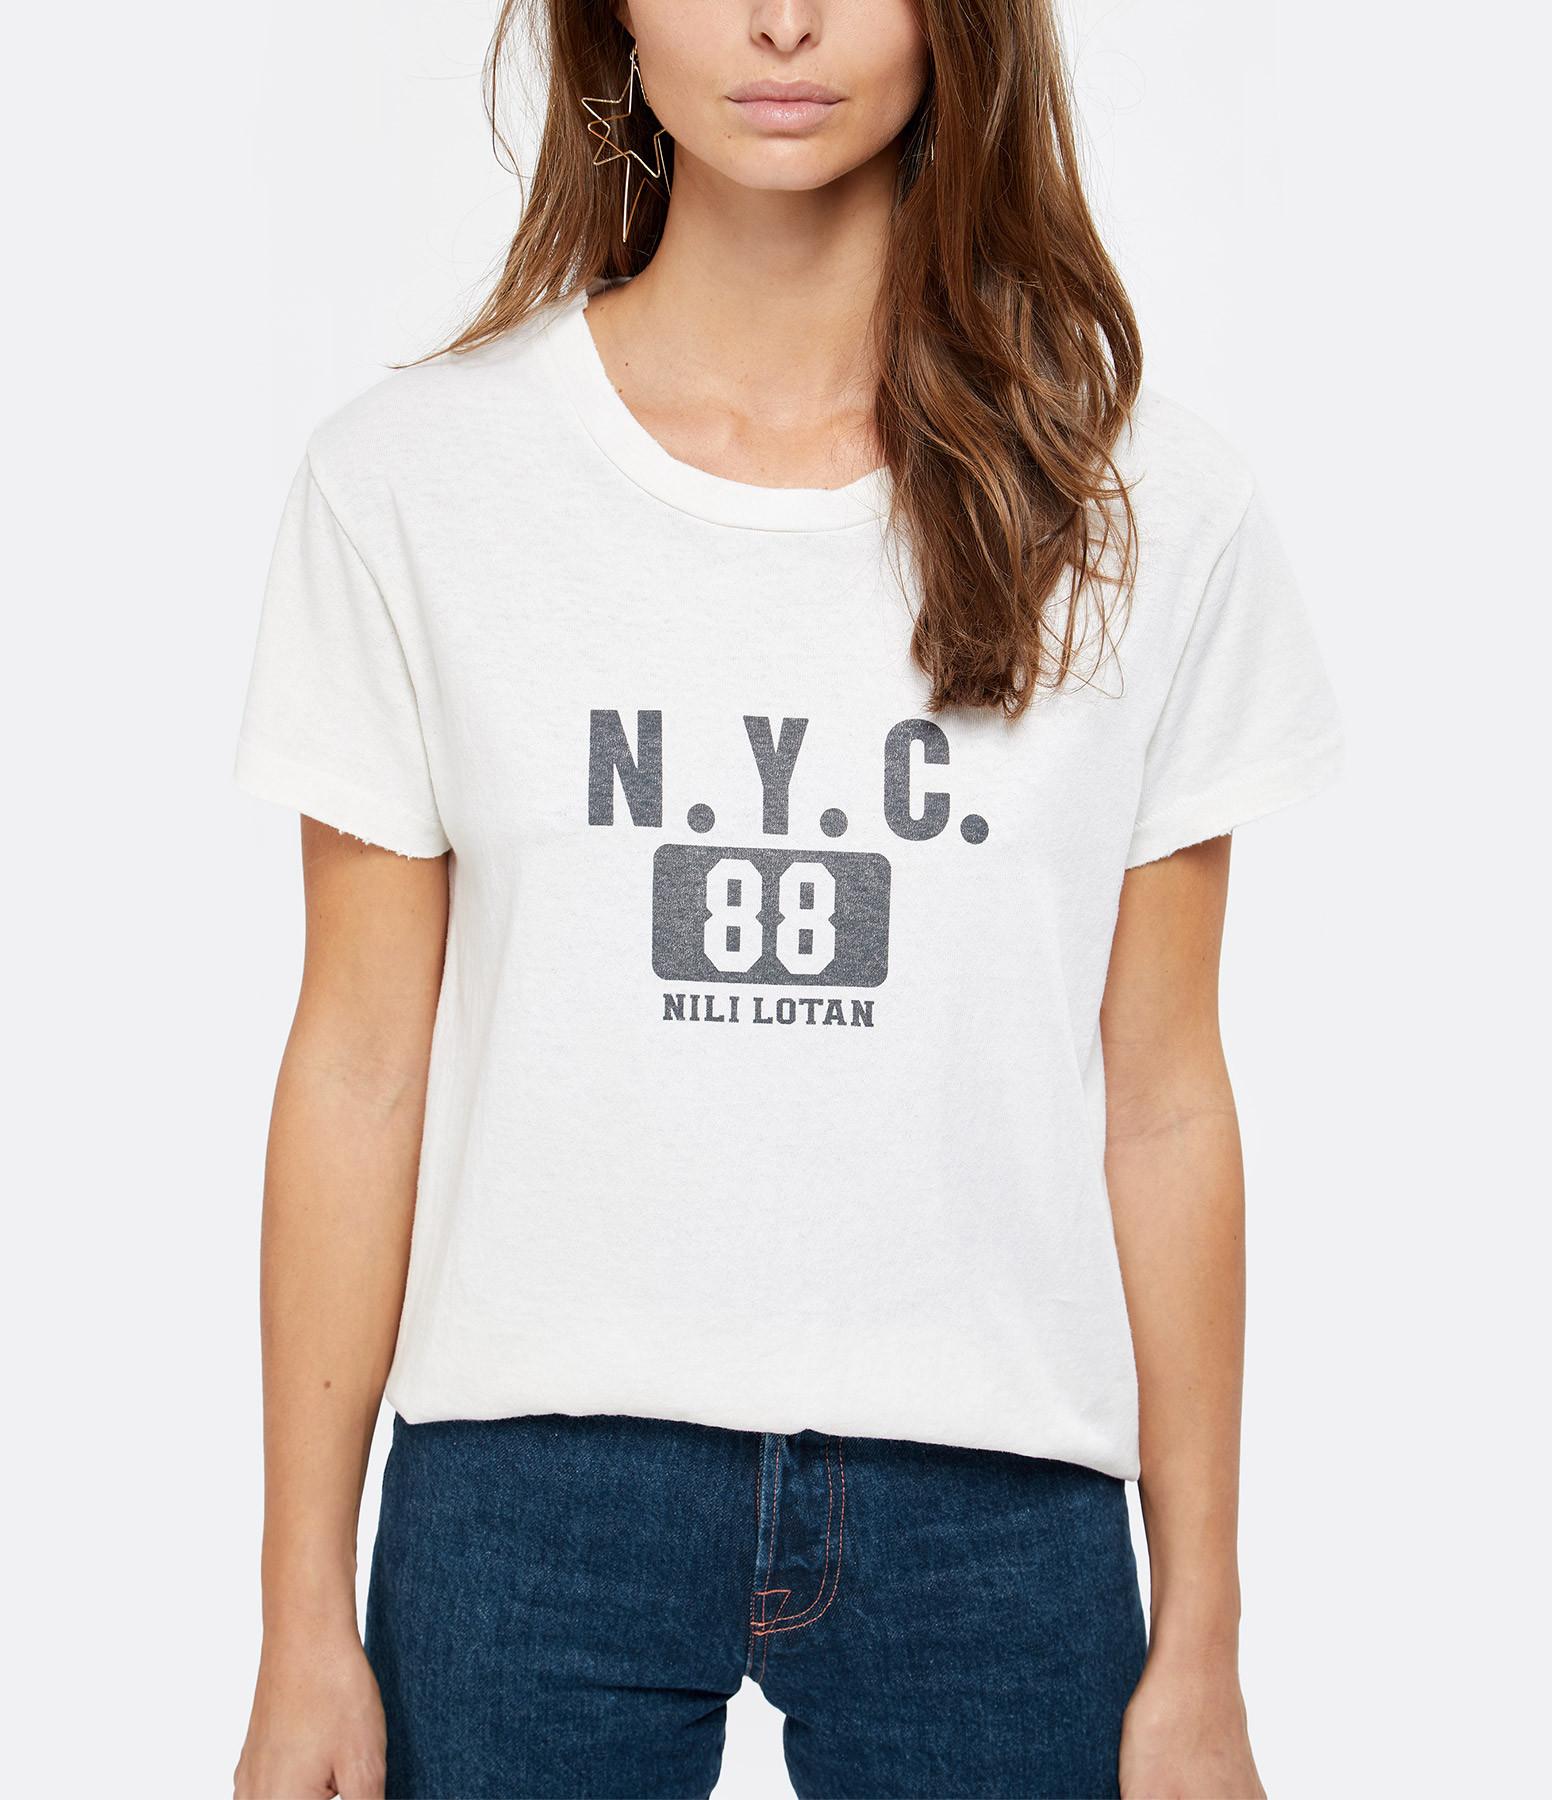 NILI LOTAN - Tee-shirt New-York 88 Imprimé Écru